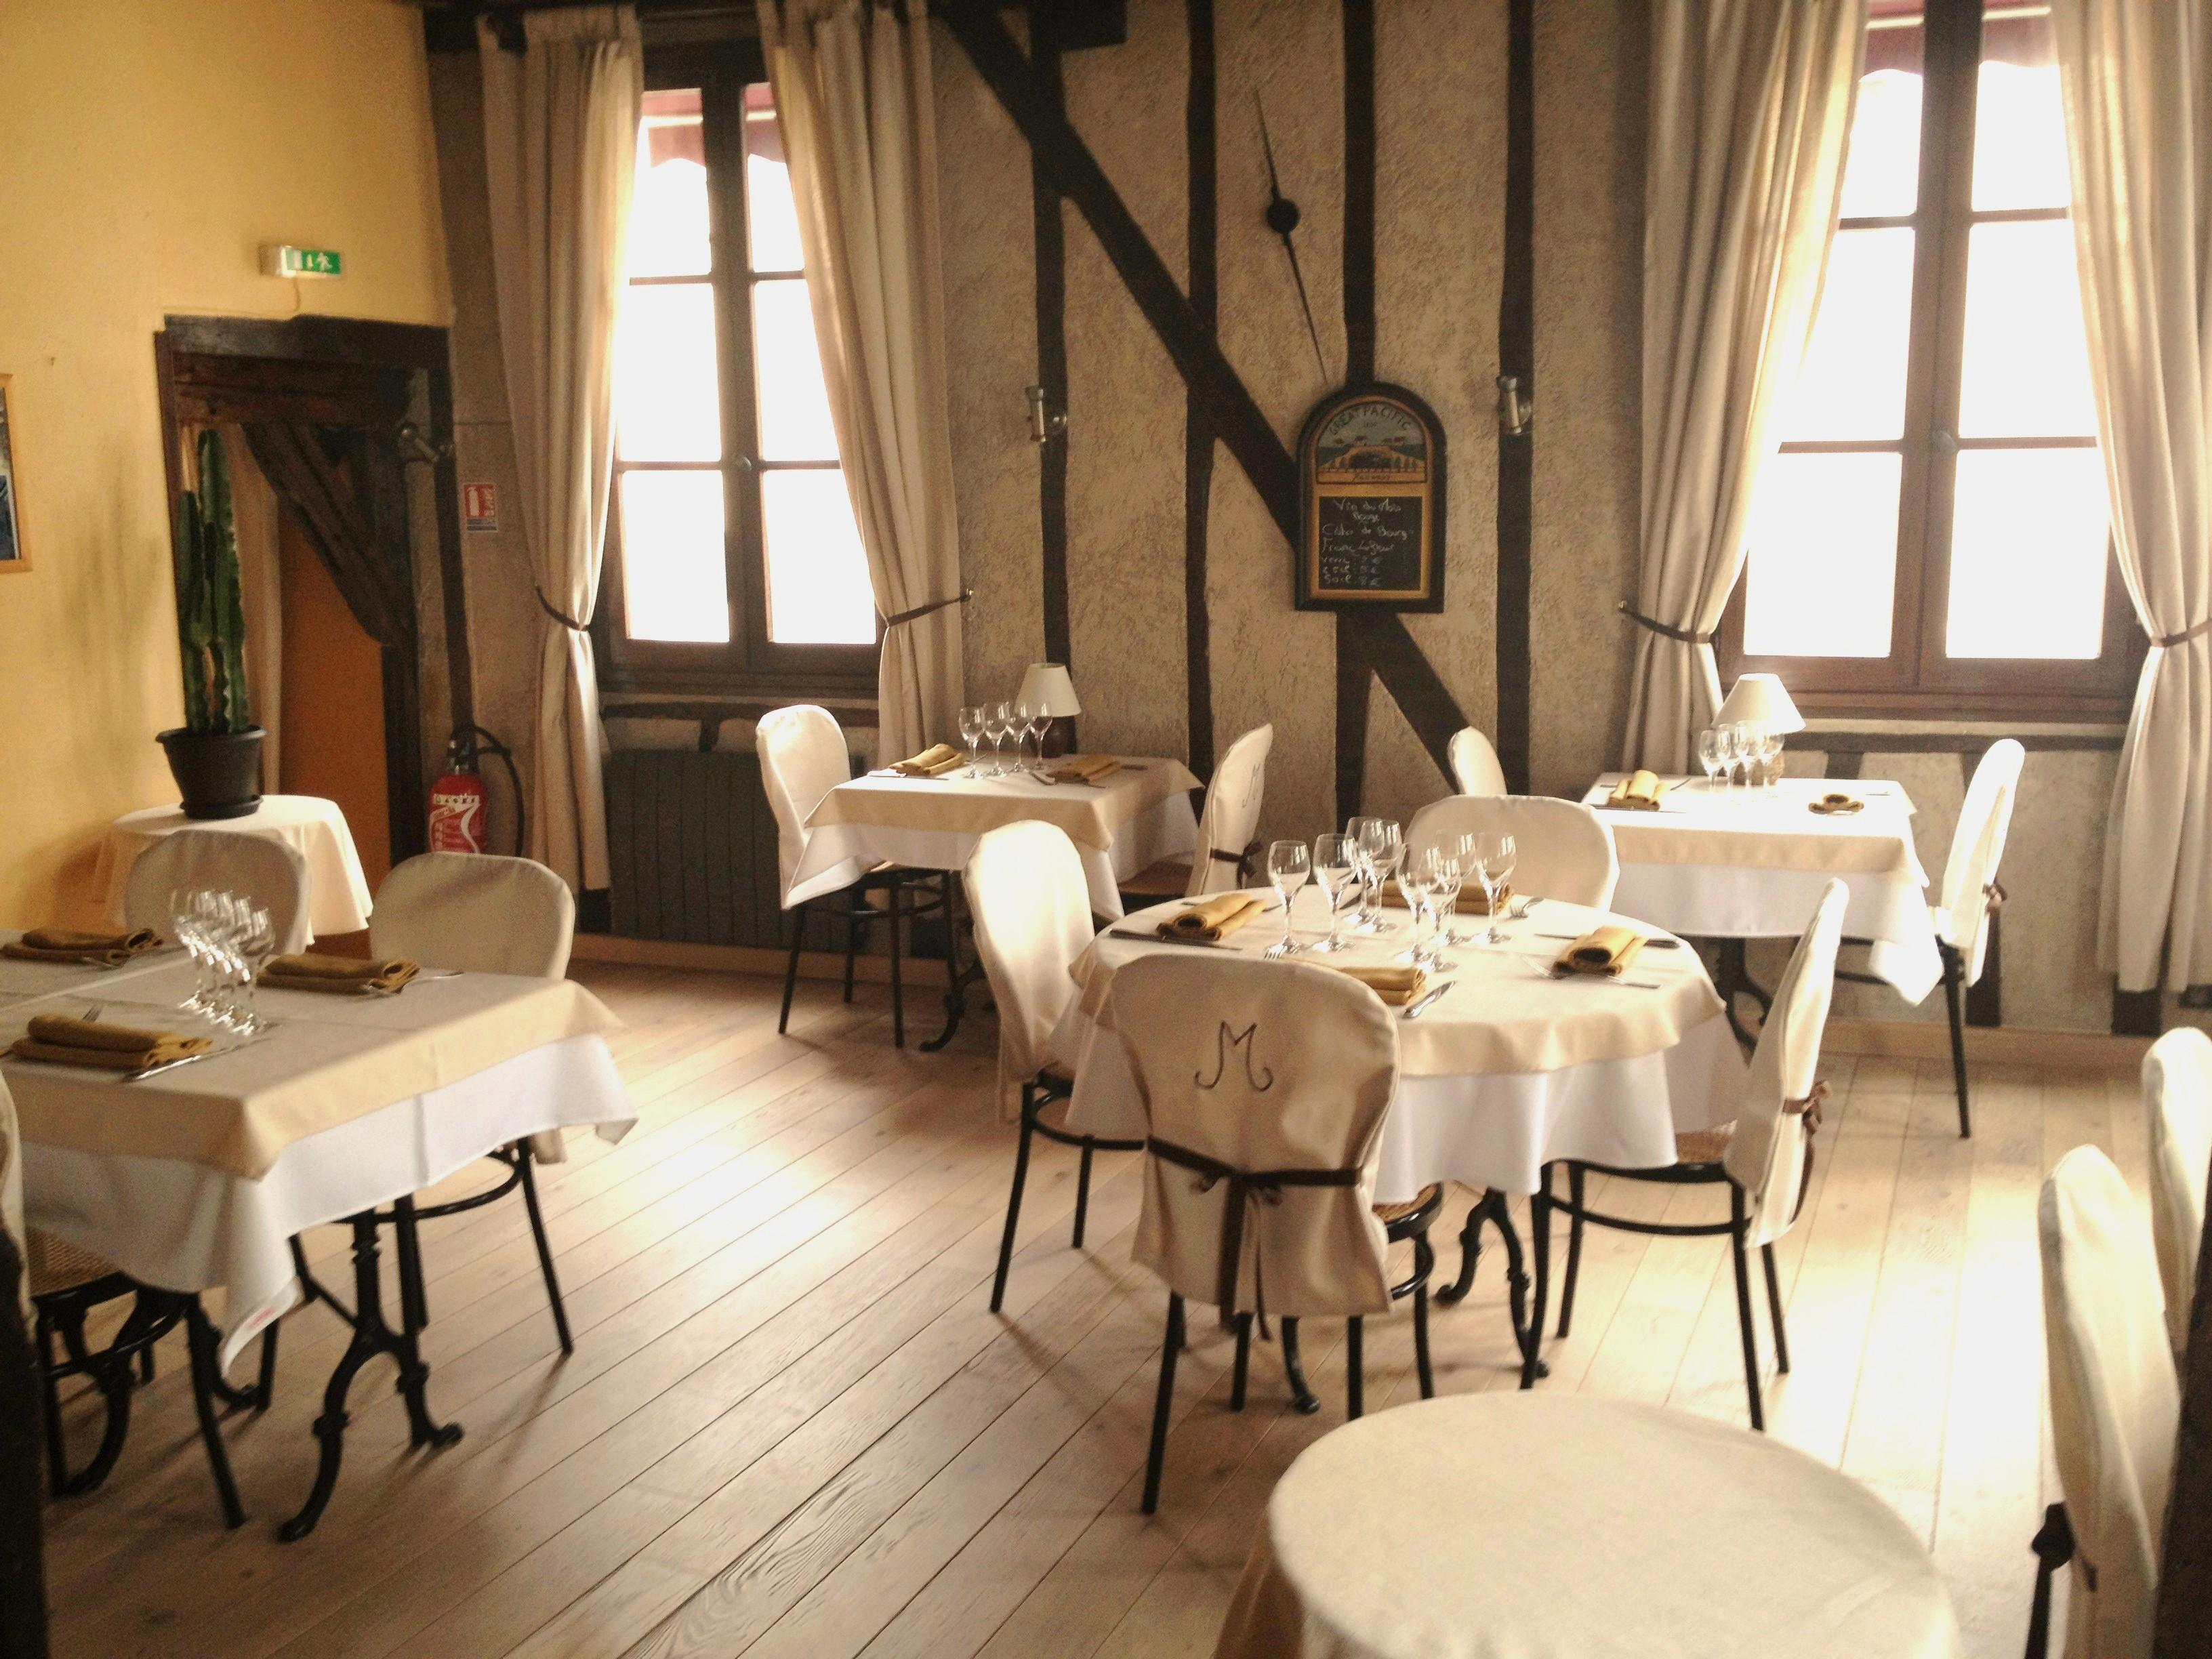 les plats restaurant la mezzanine s zanne marne. Black Bedroom Furniture Sets. Home Design Ideas